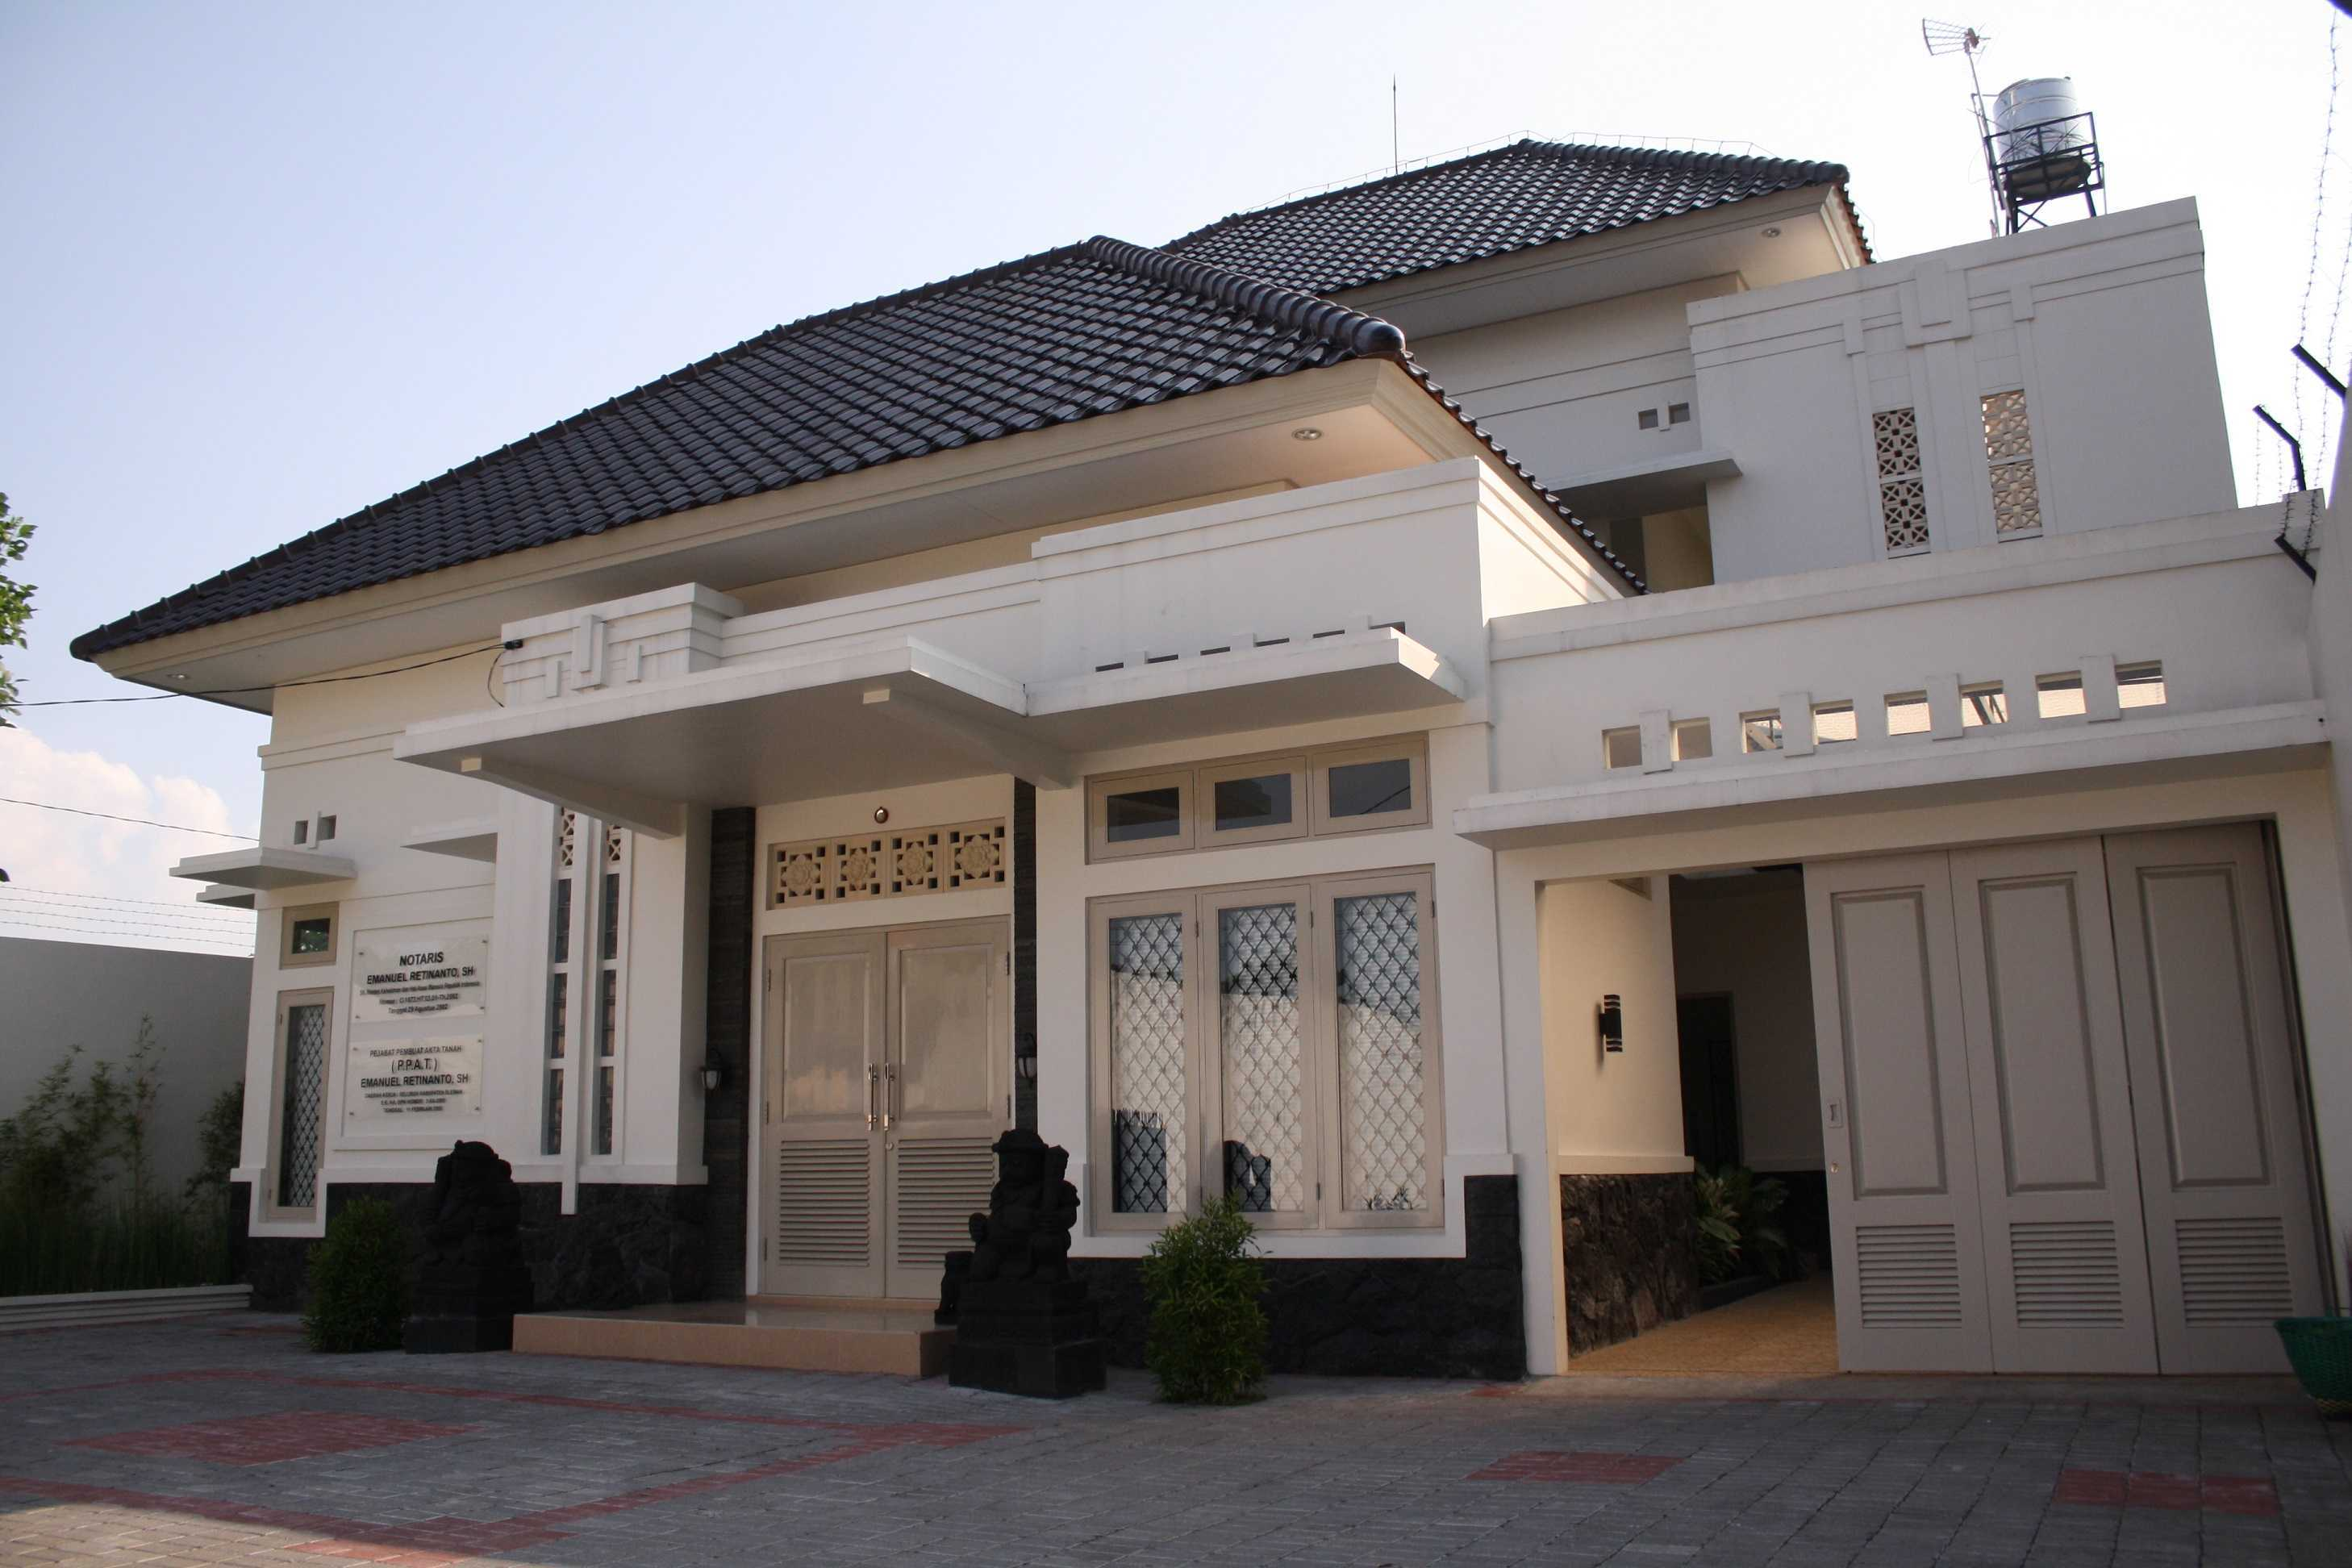 Vastu Cipta Persada Notary Office Daerah Istimewa Yogyakarta, Indonesia Daerah Istimewa Yogyakarta, Indonesia Side View Art Deco  39444